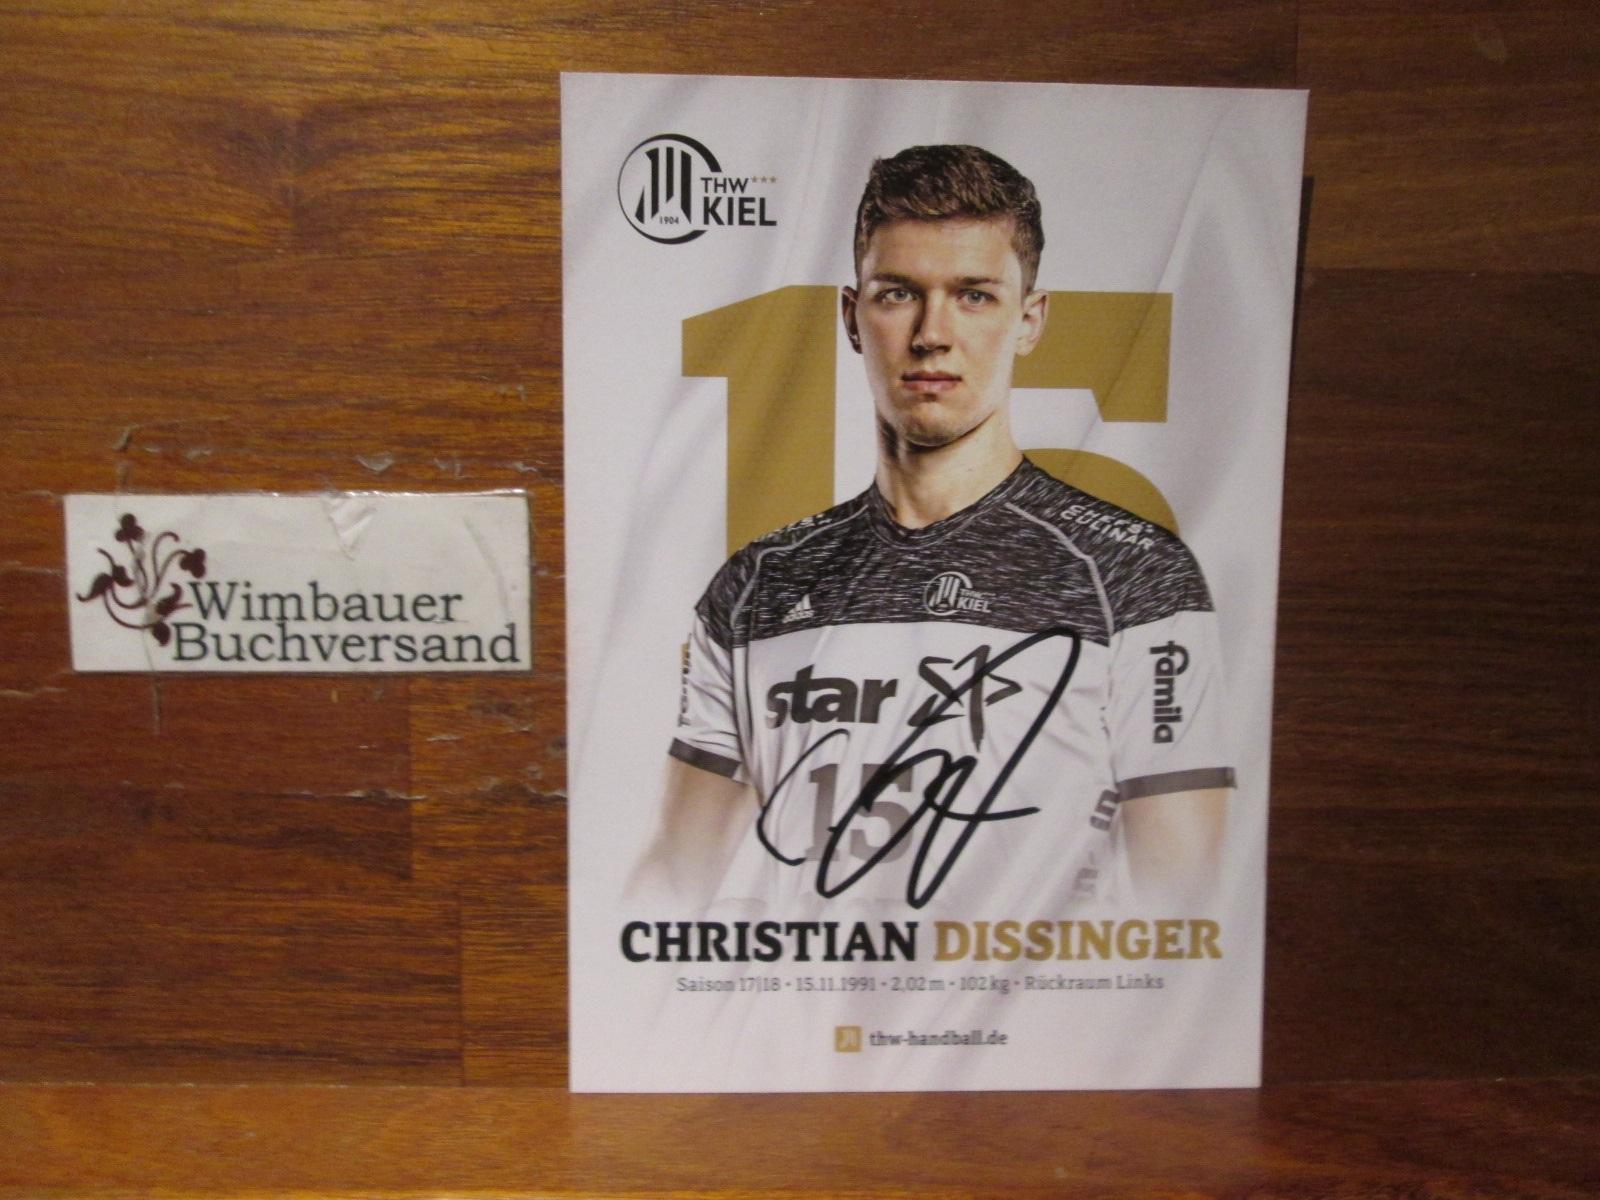 Original Autogramm Christian Dissinger THW Kiel /// Autogramm Autograph signiert signed signee